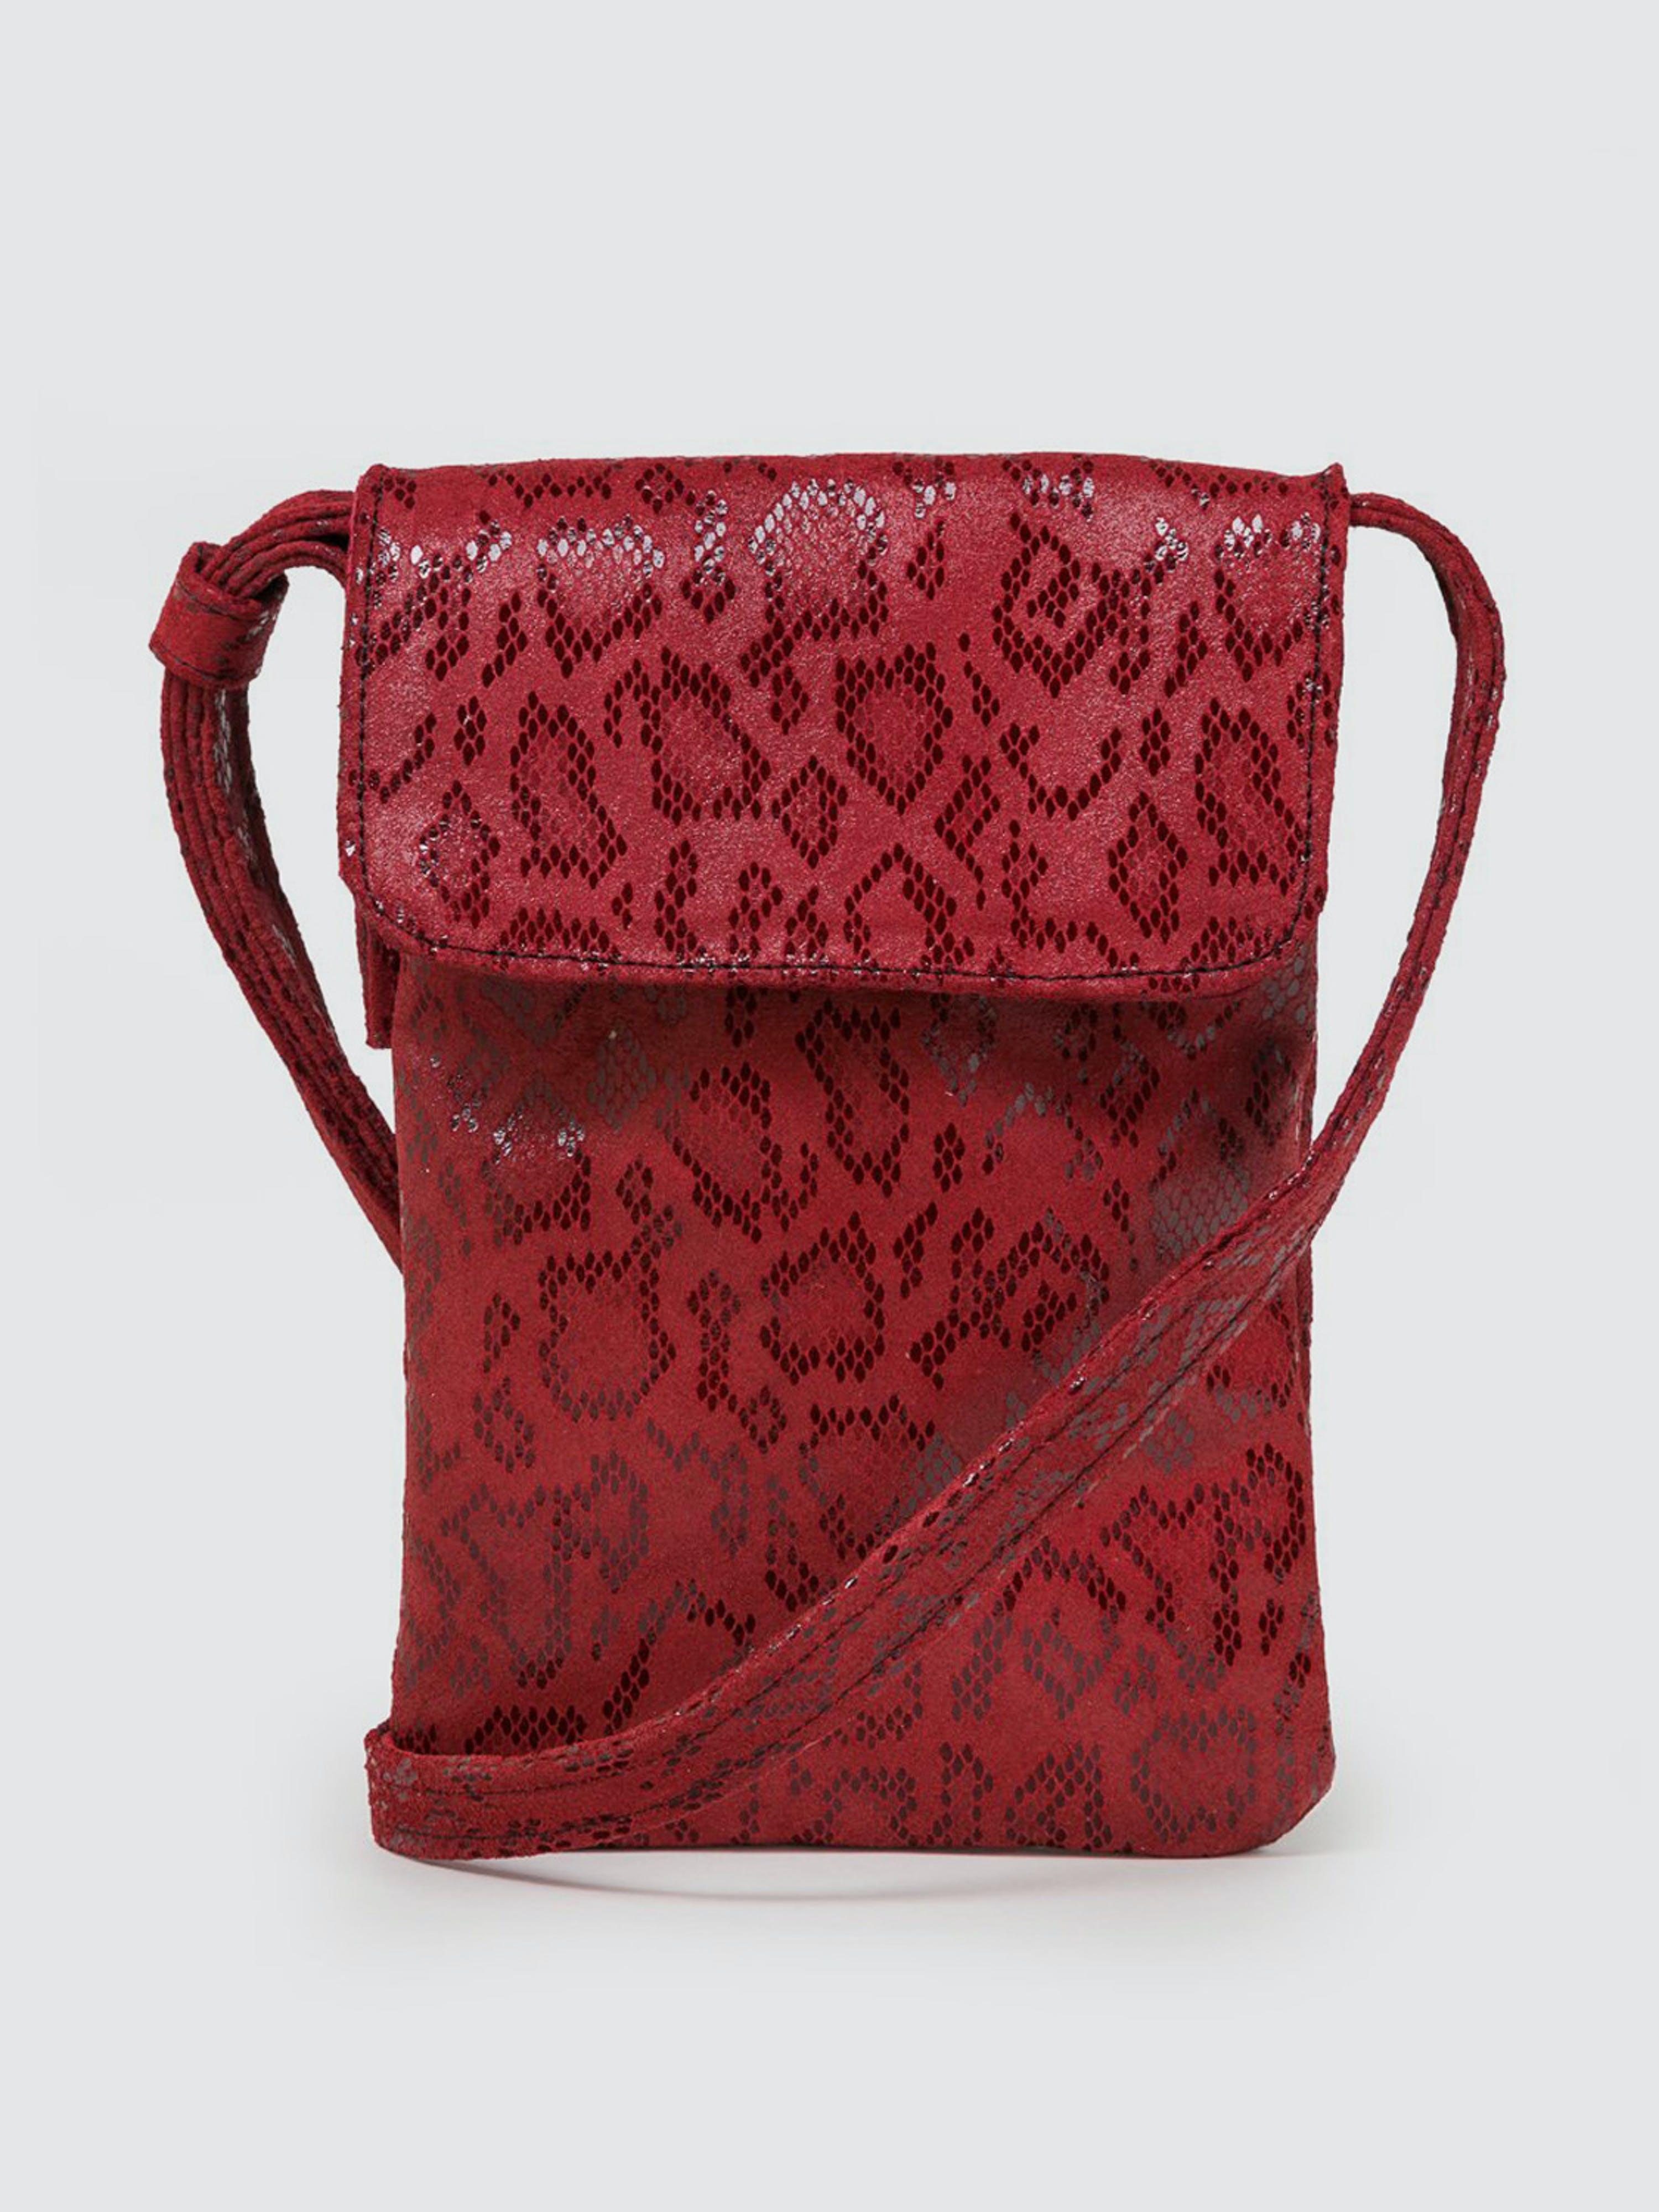 CoFi Leathers Penny Phone Bag: Red Anaconda  - Red